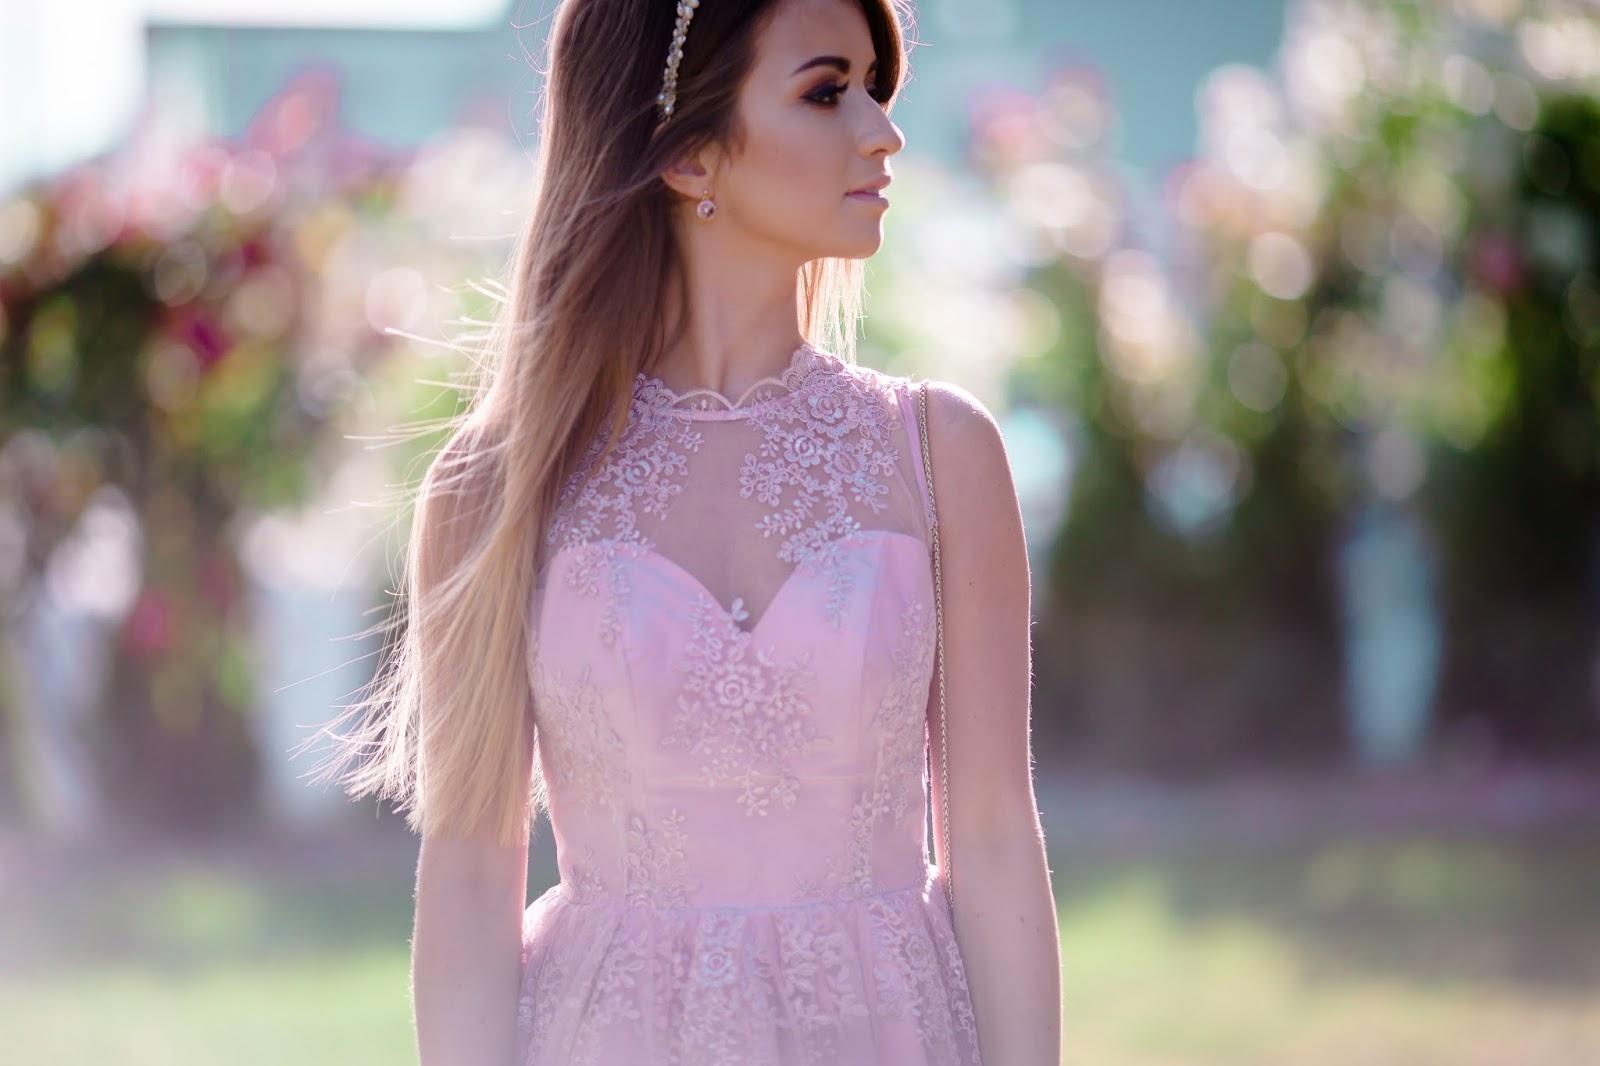 Stylizacja Na Wesele Pudrowa Sukienka Z Koronki Like A Princess